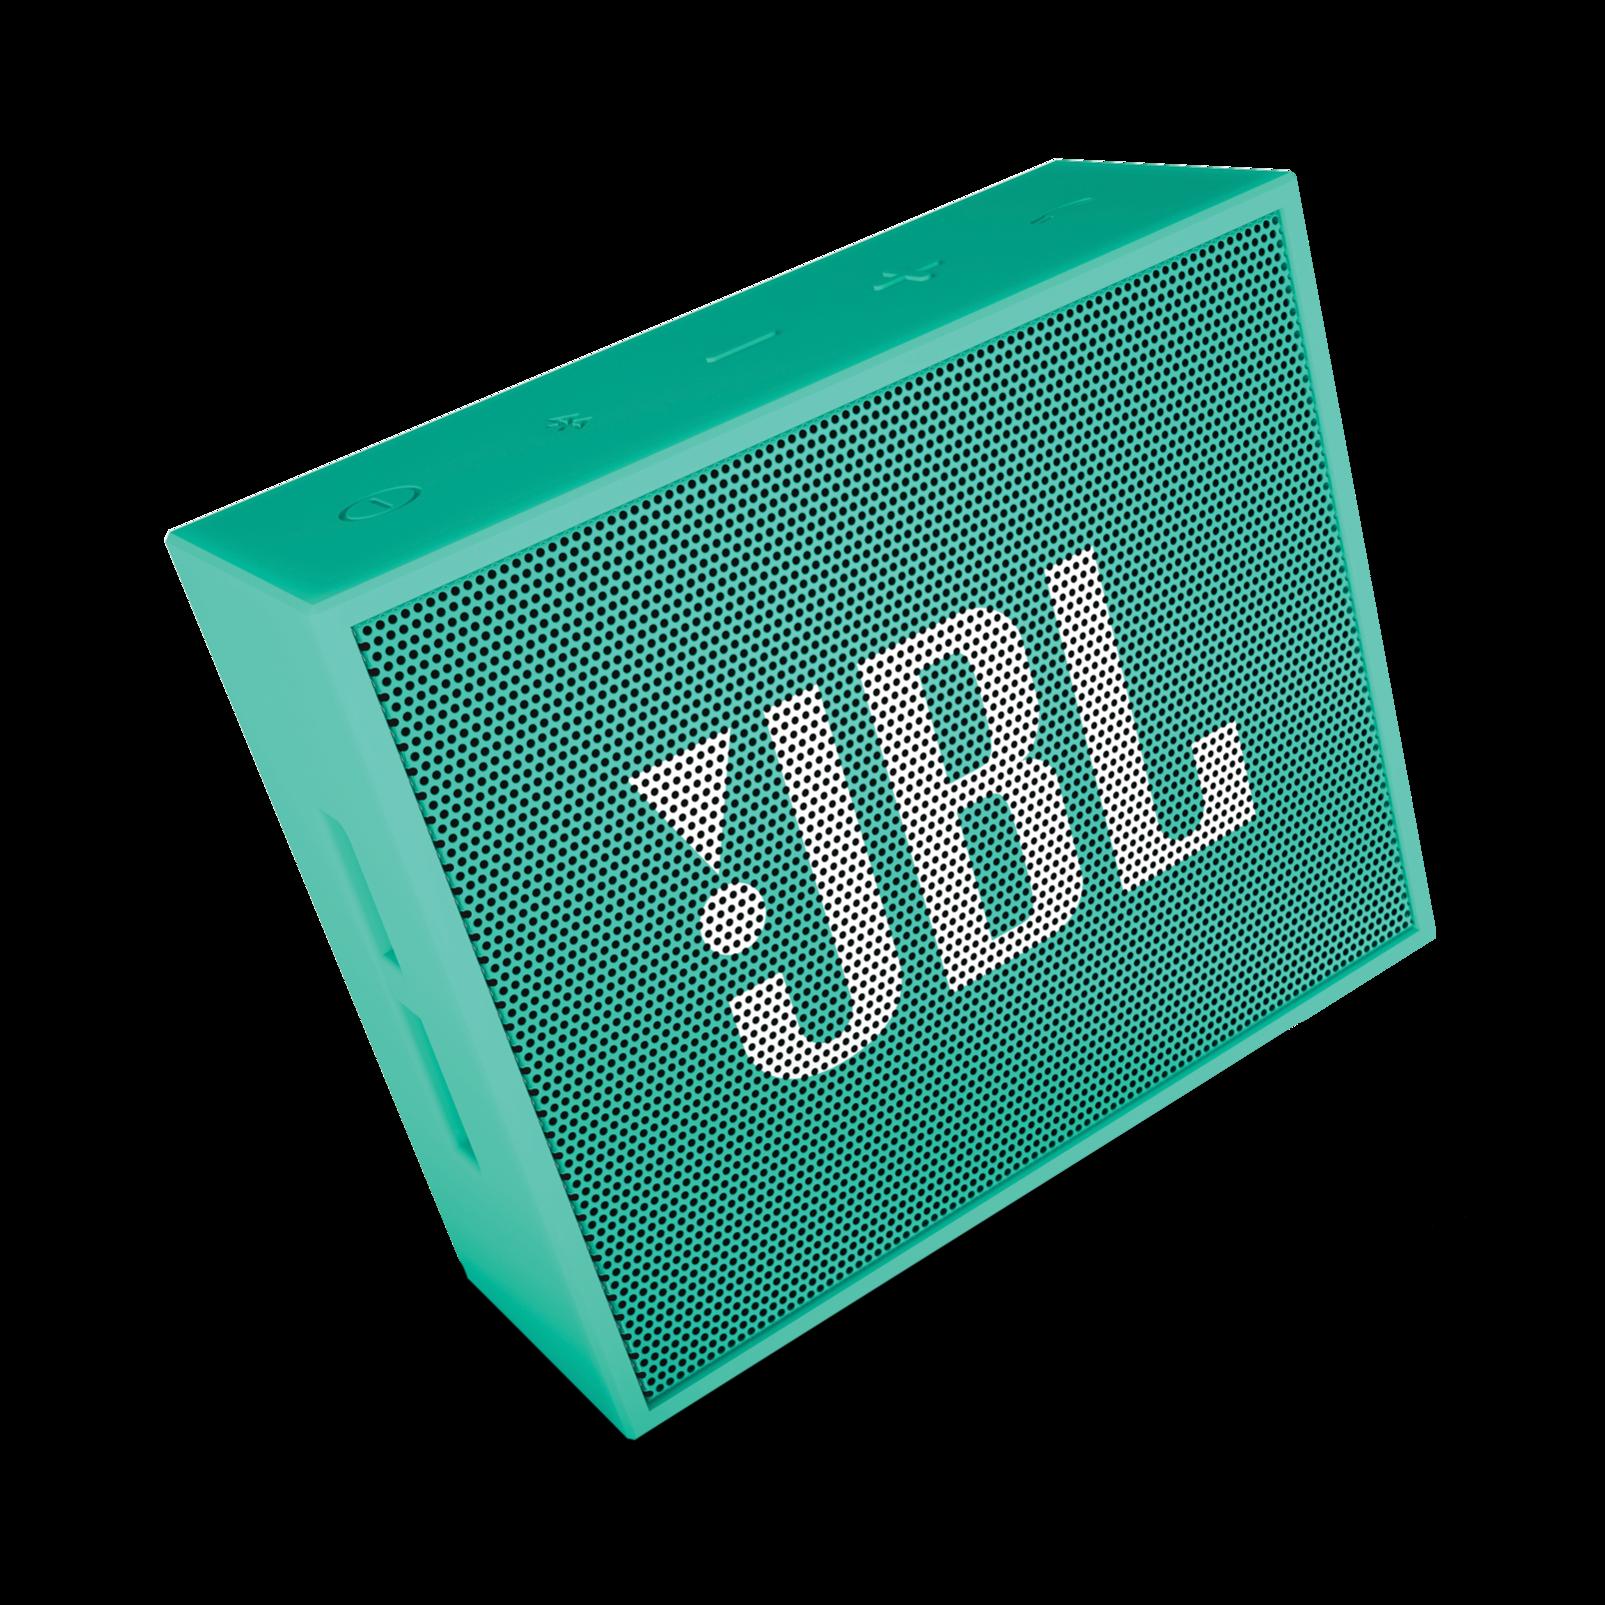 Enceinte Bluetooth Turquoise - GO